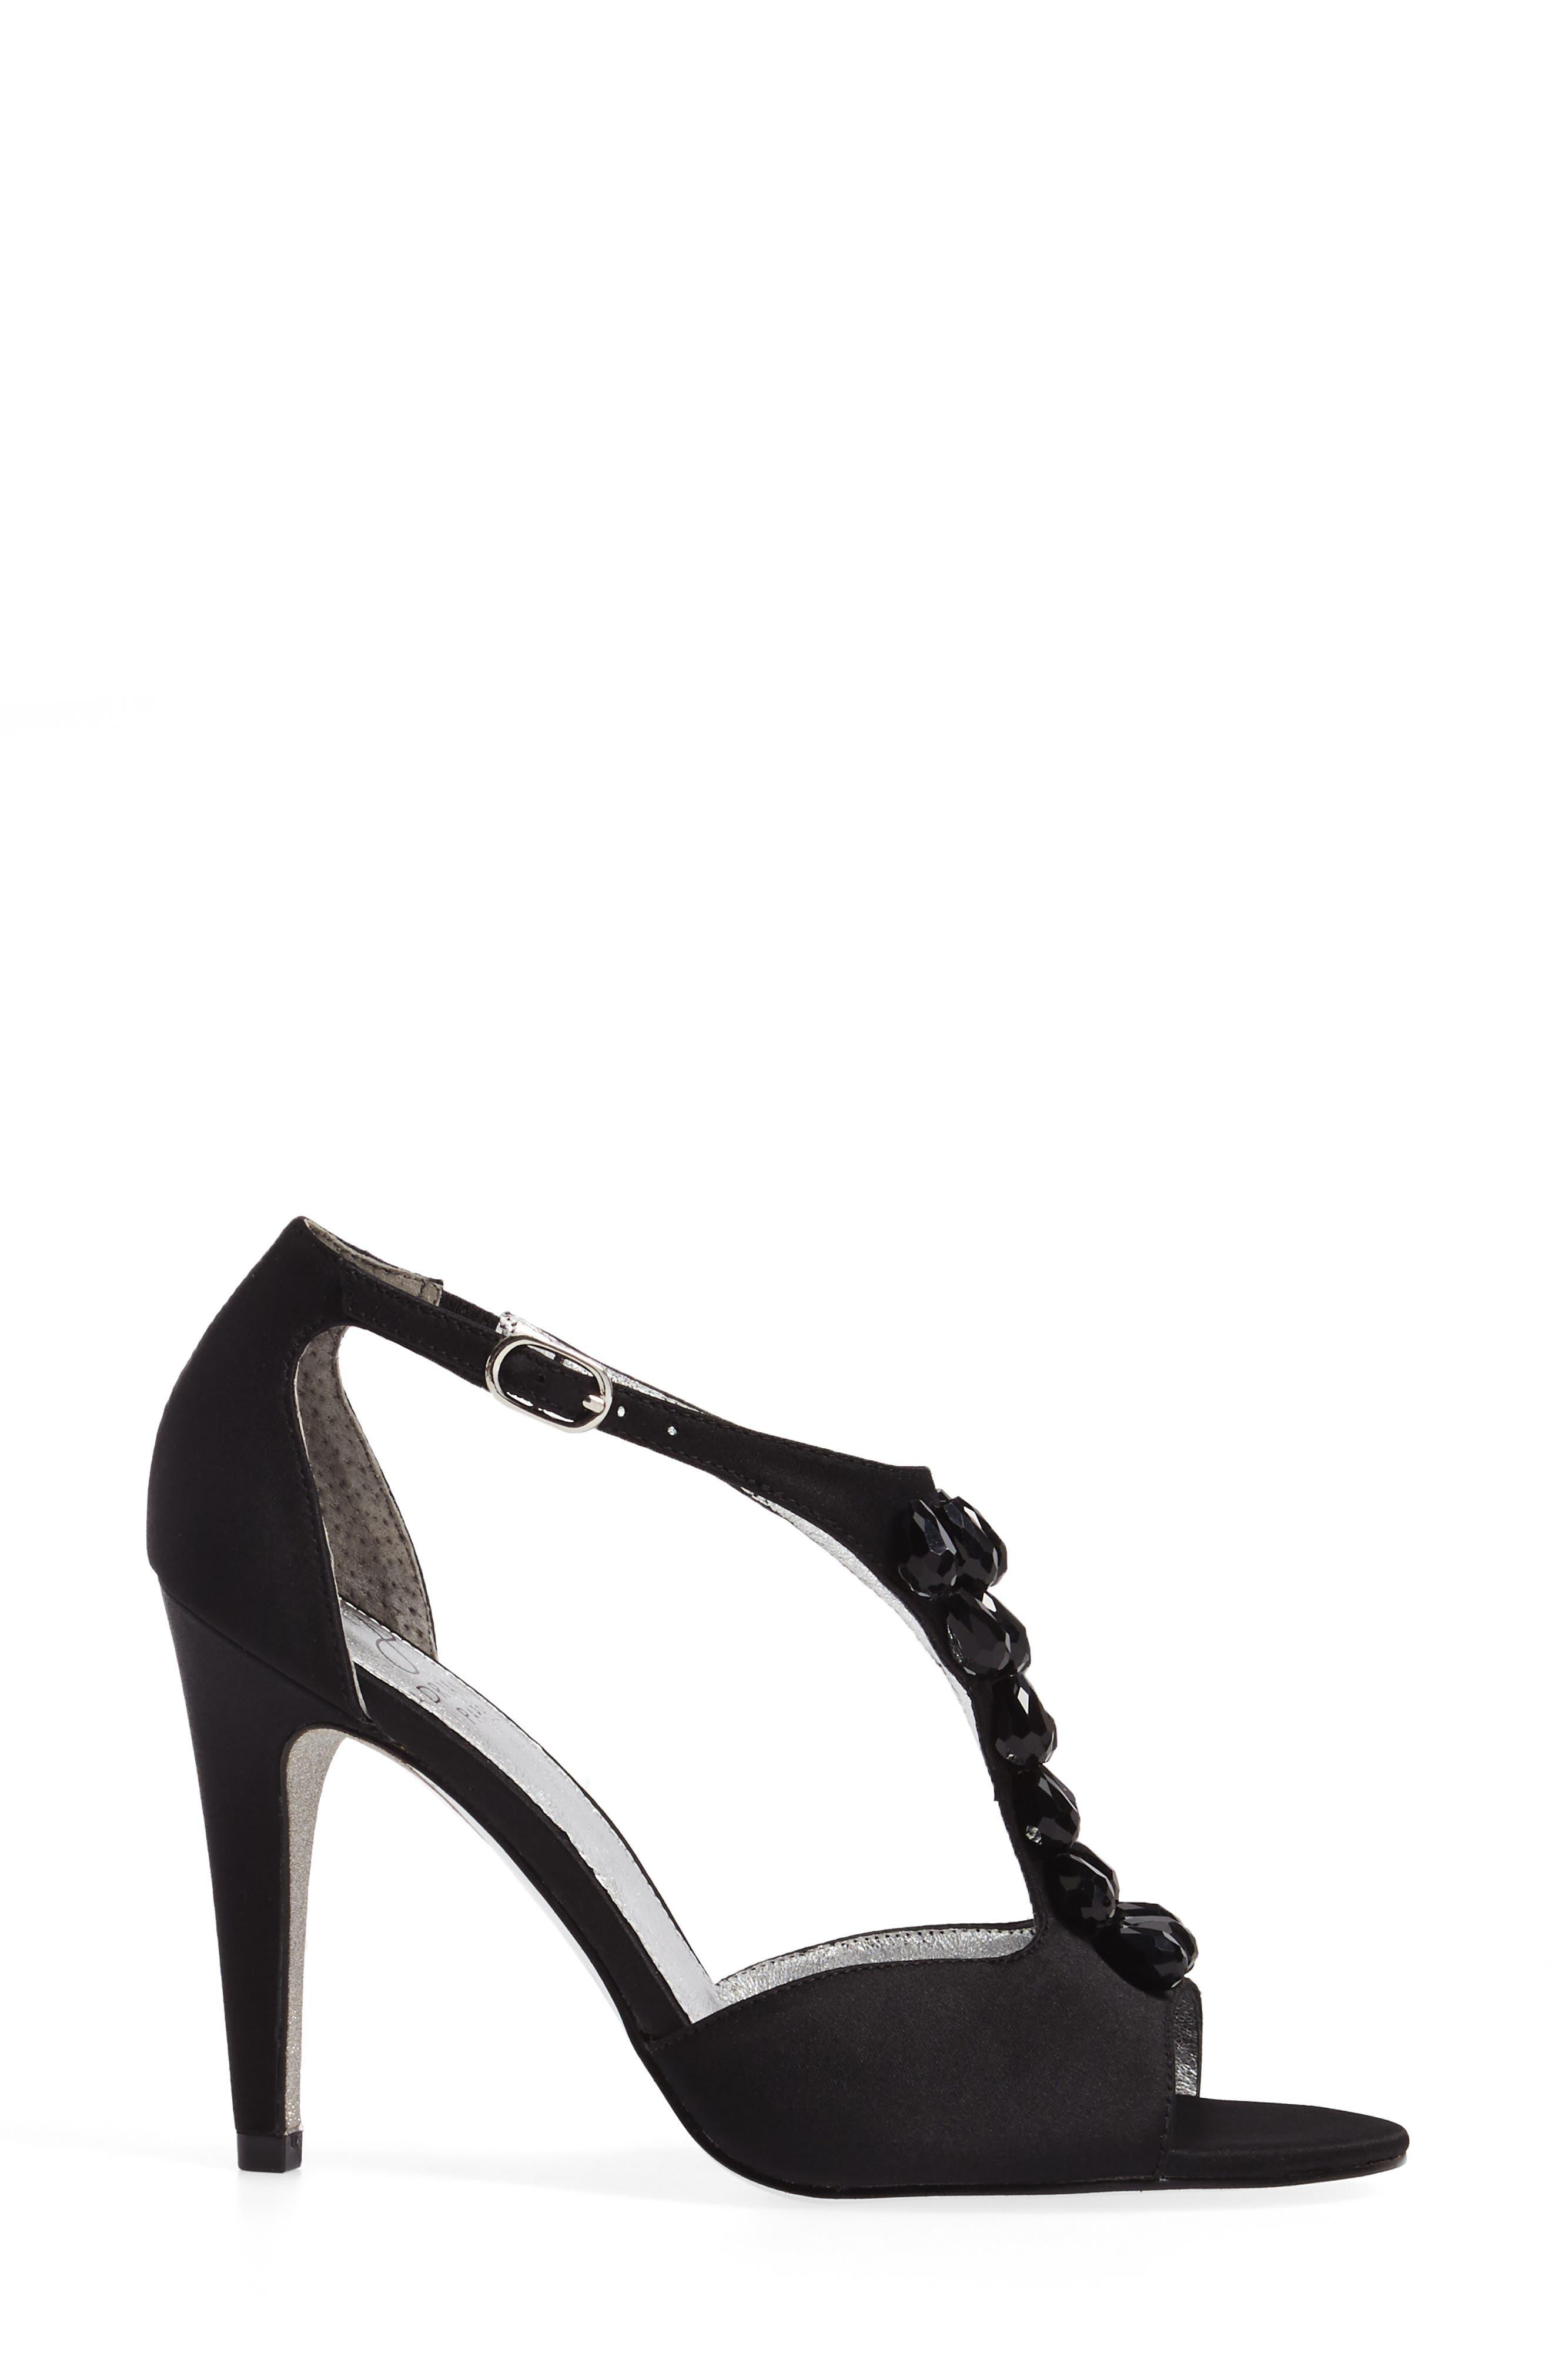 Alternate Image 3  - Adrianna Papell Esmond Embellished Sandal (Women)